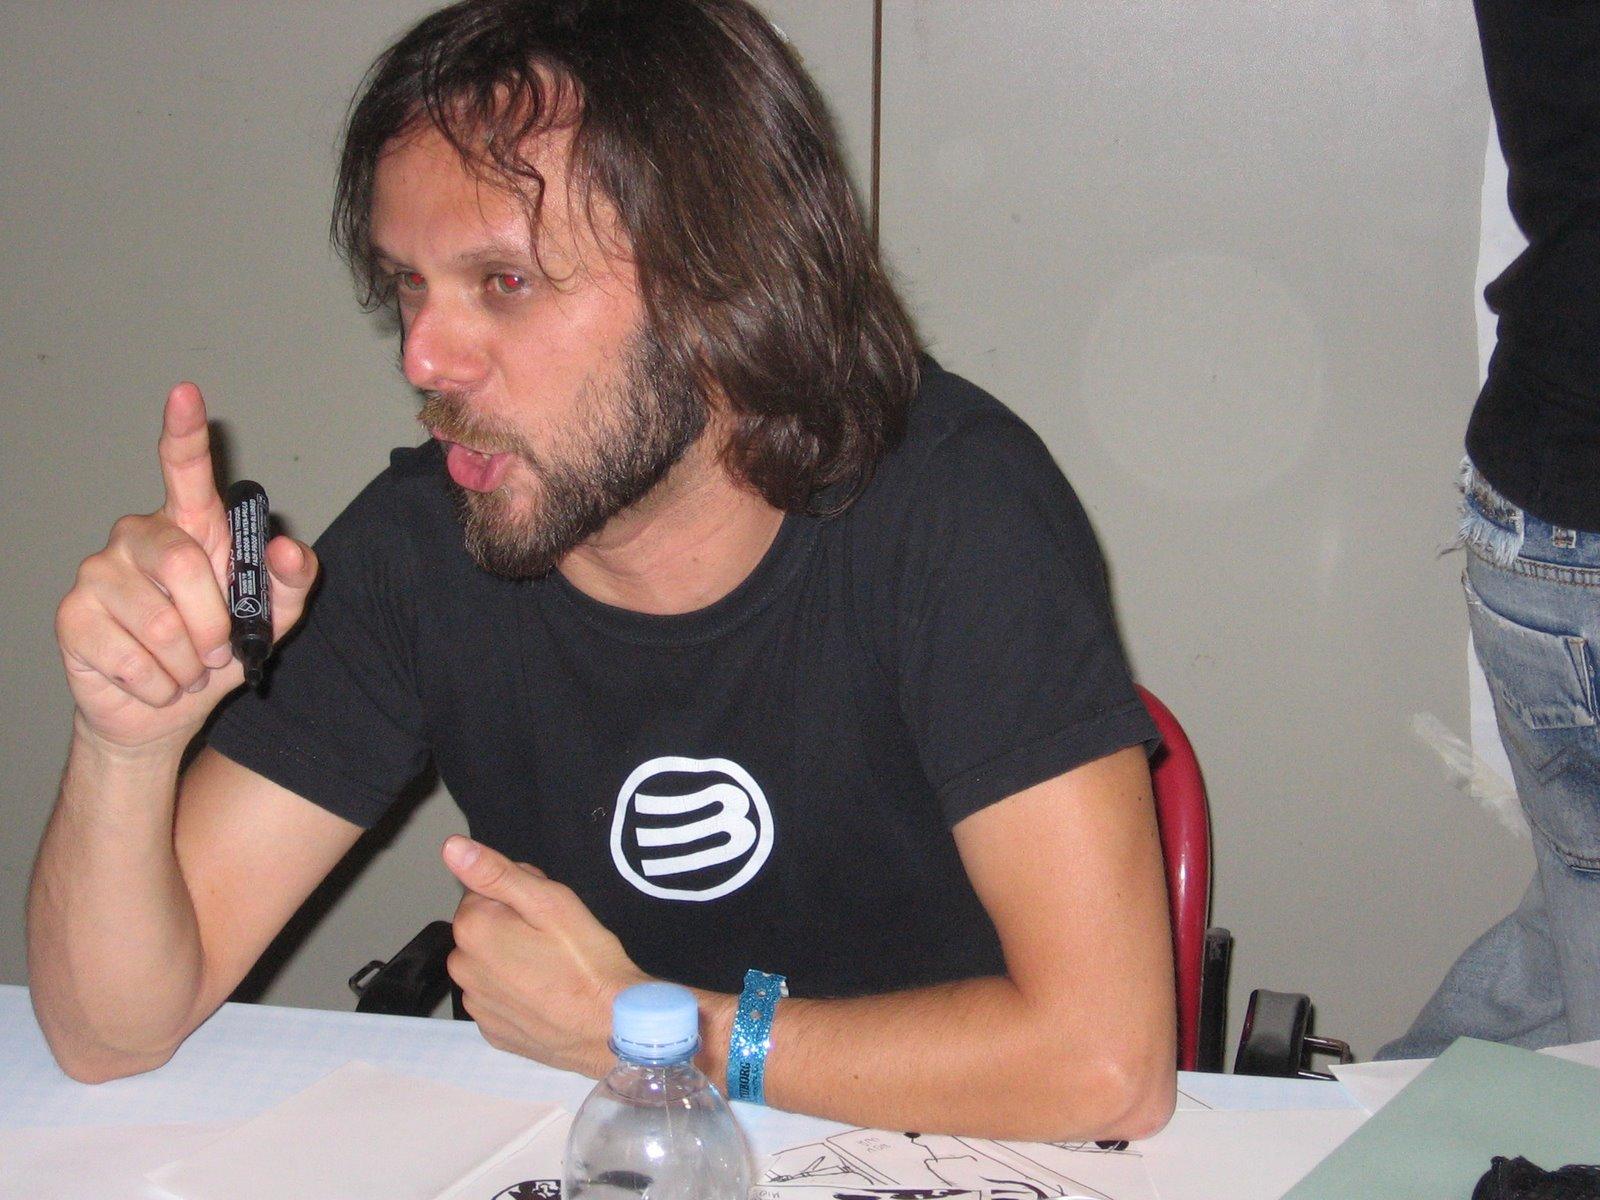 Matteo Casali